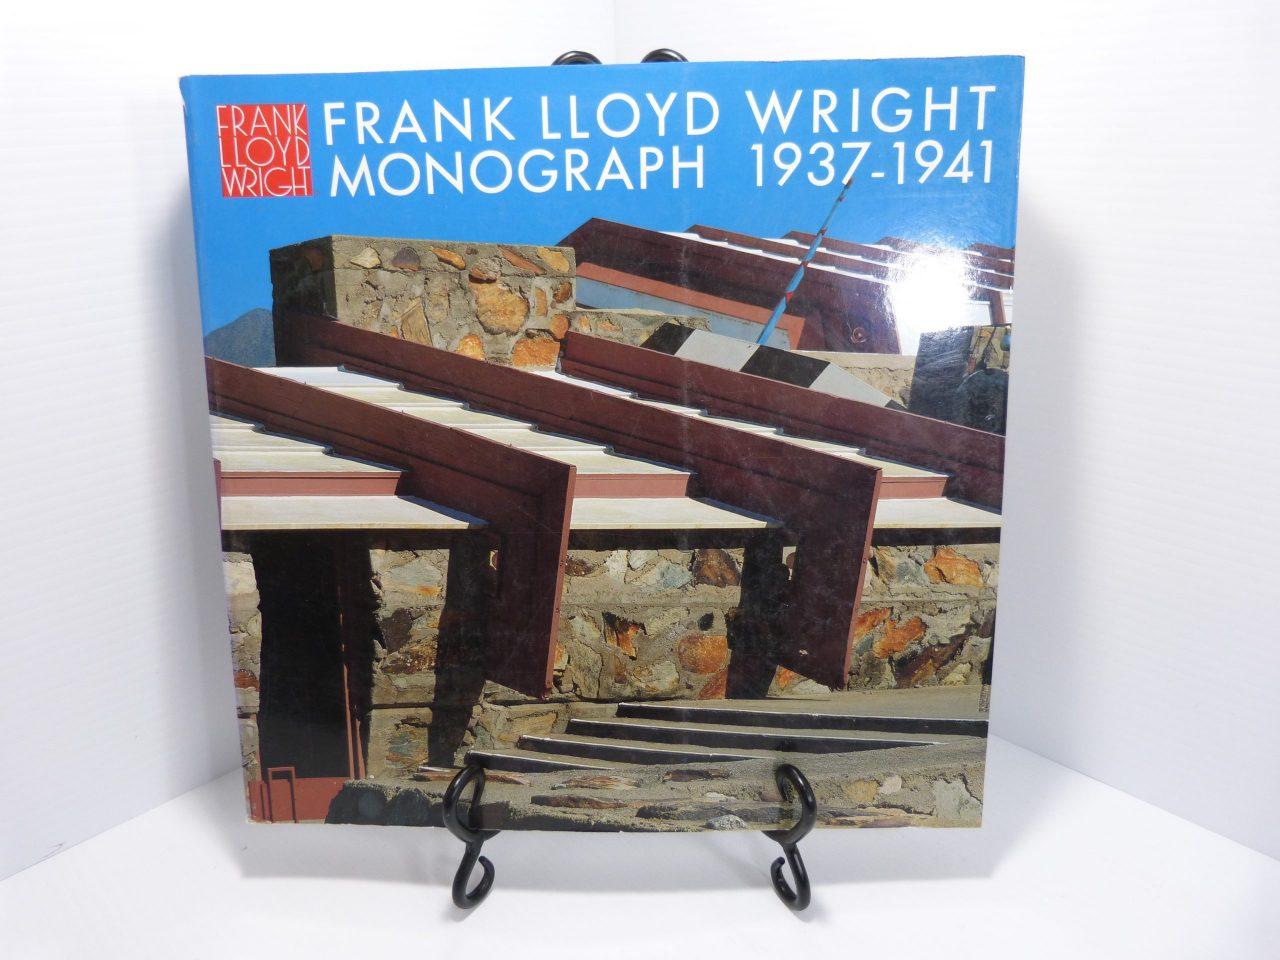 Frank Lloyd Wright Monograph Vol. 6 1937-1941 Softcover